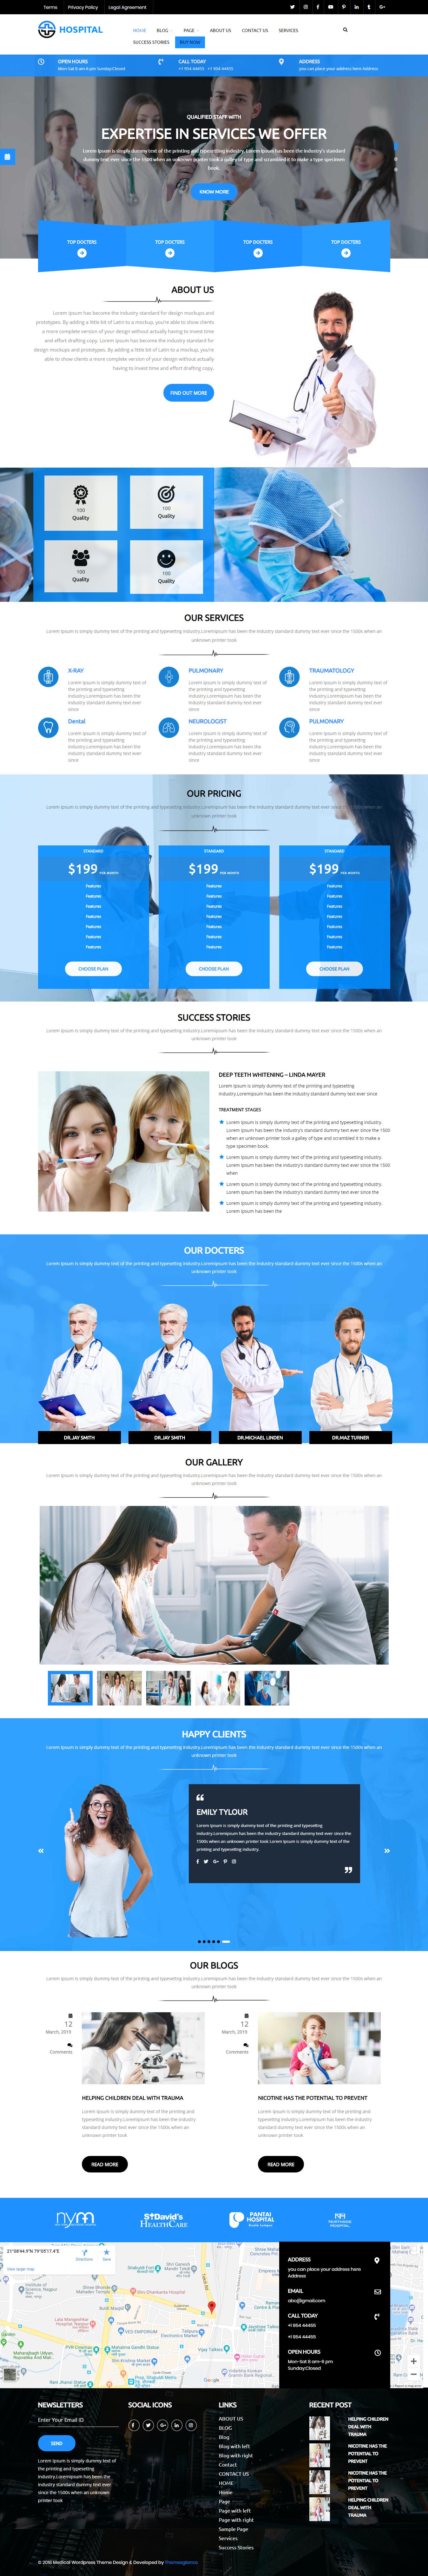 medical hospital best free science wordpress theme - 10+ Best Free Science WordPress Themes